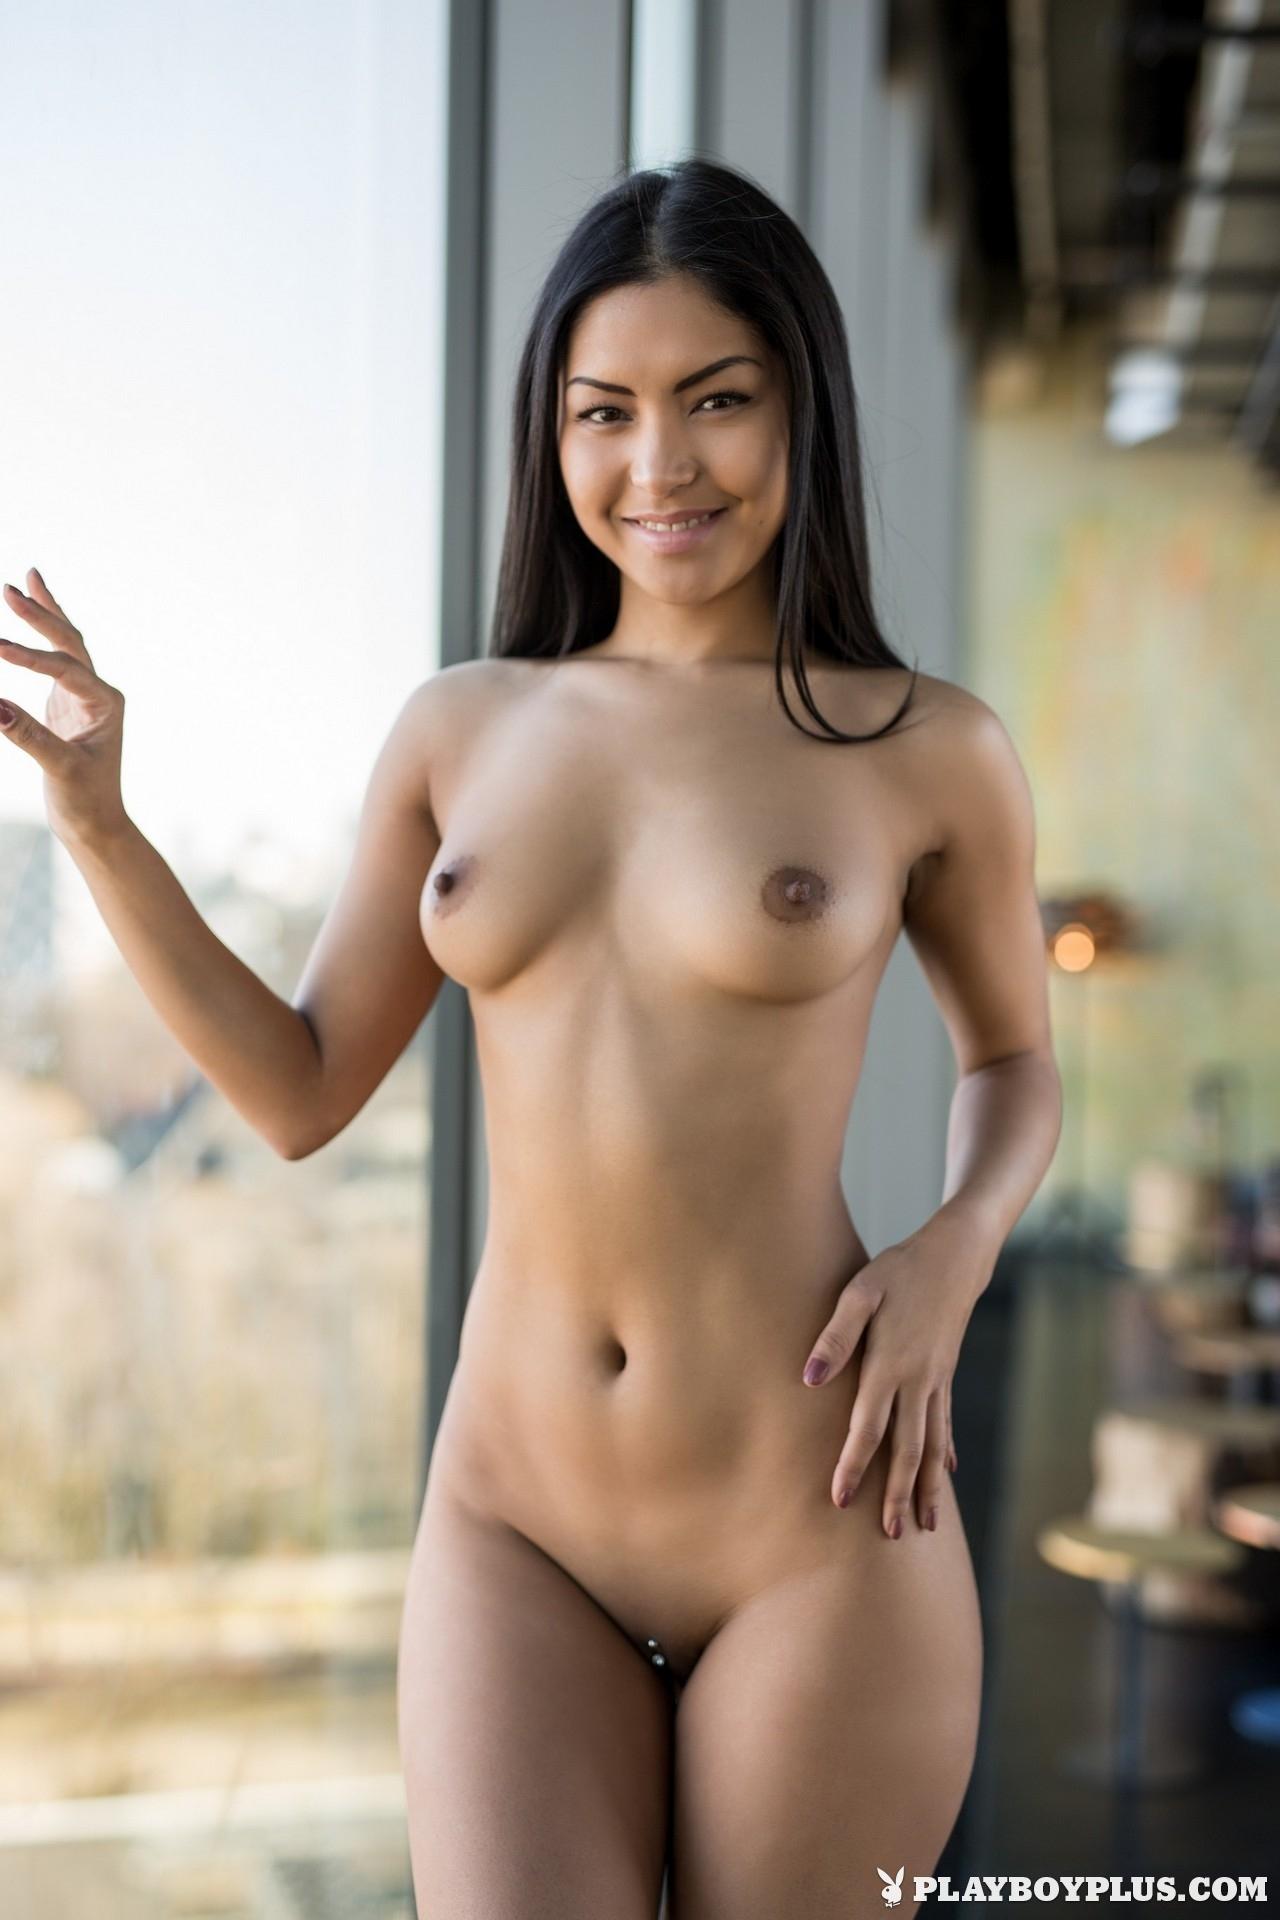 Playboy Plus Chloe Rose In Inspiring View (17)